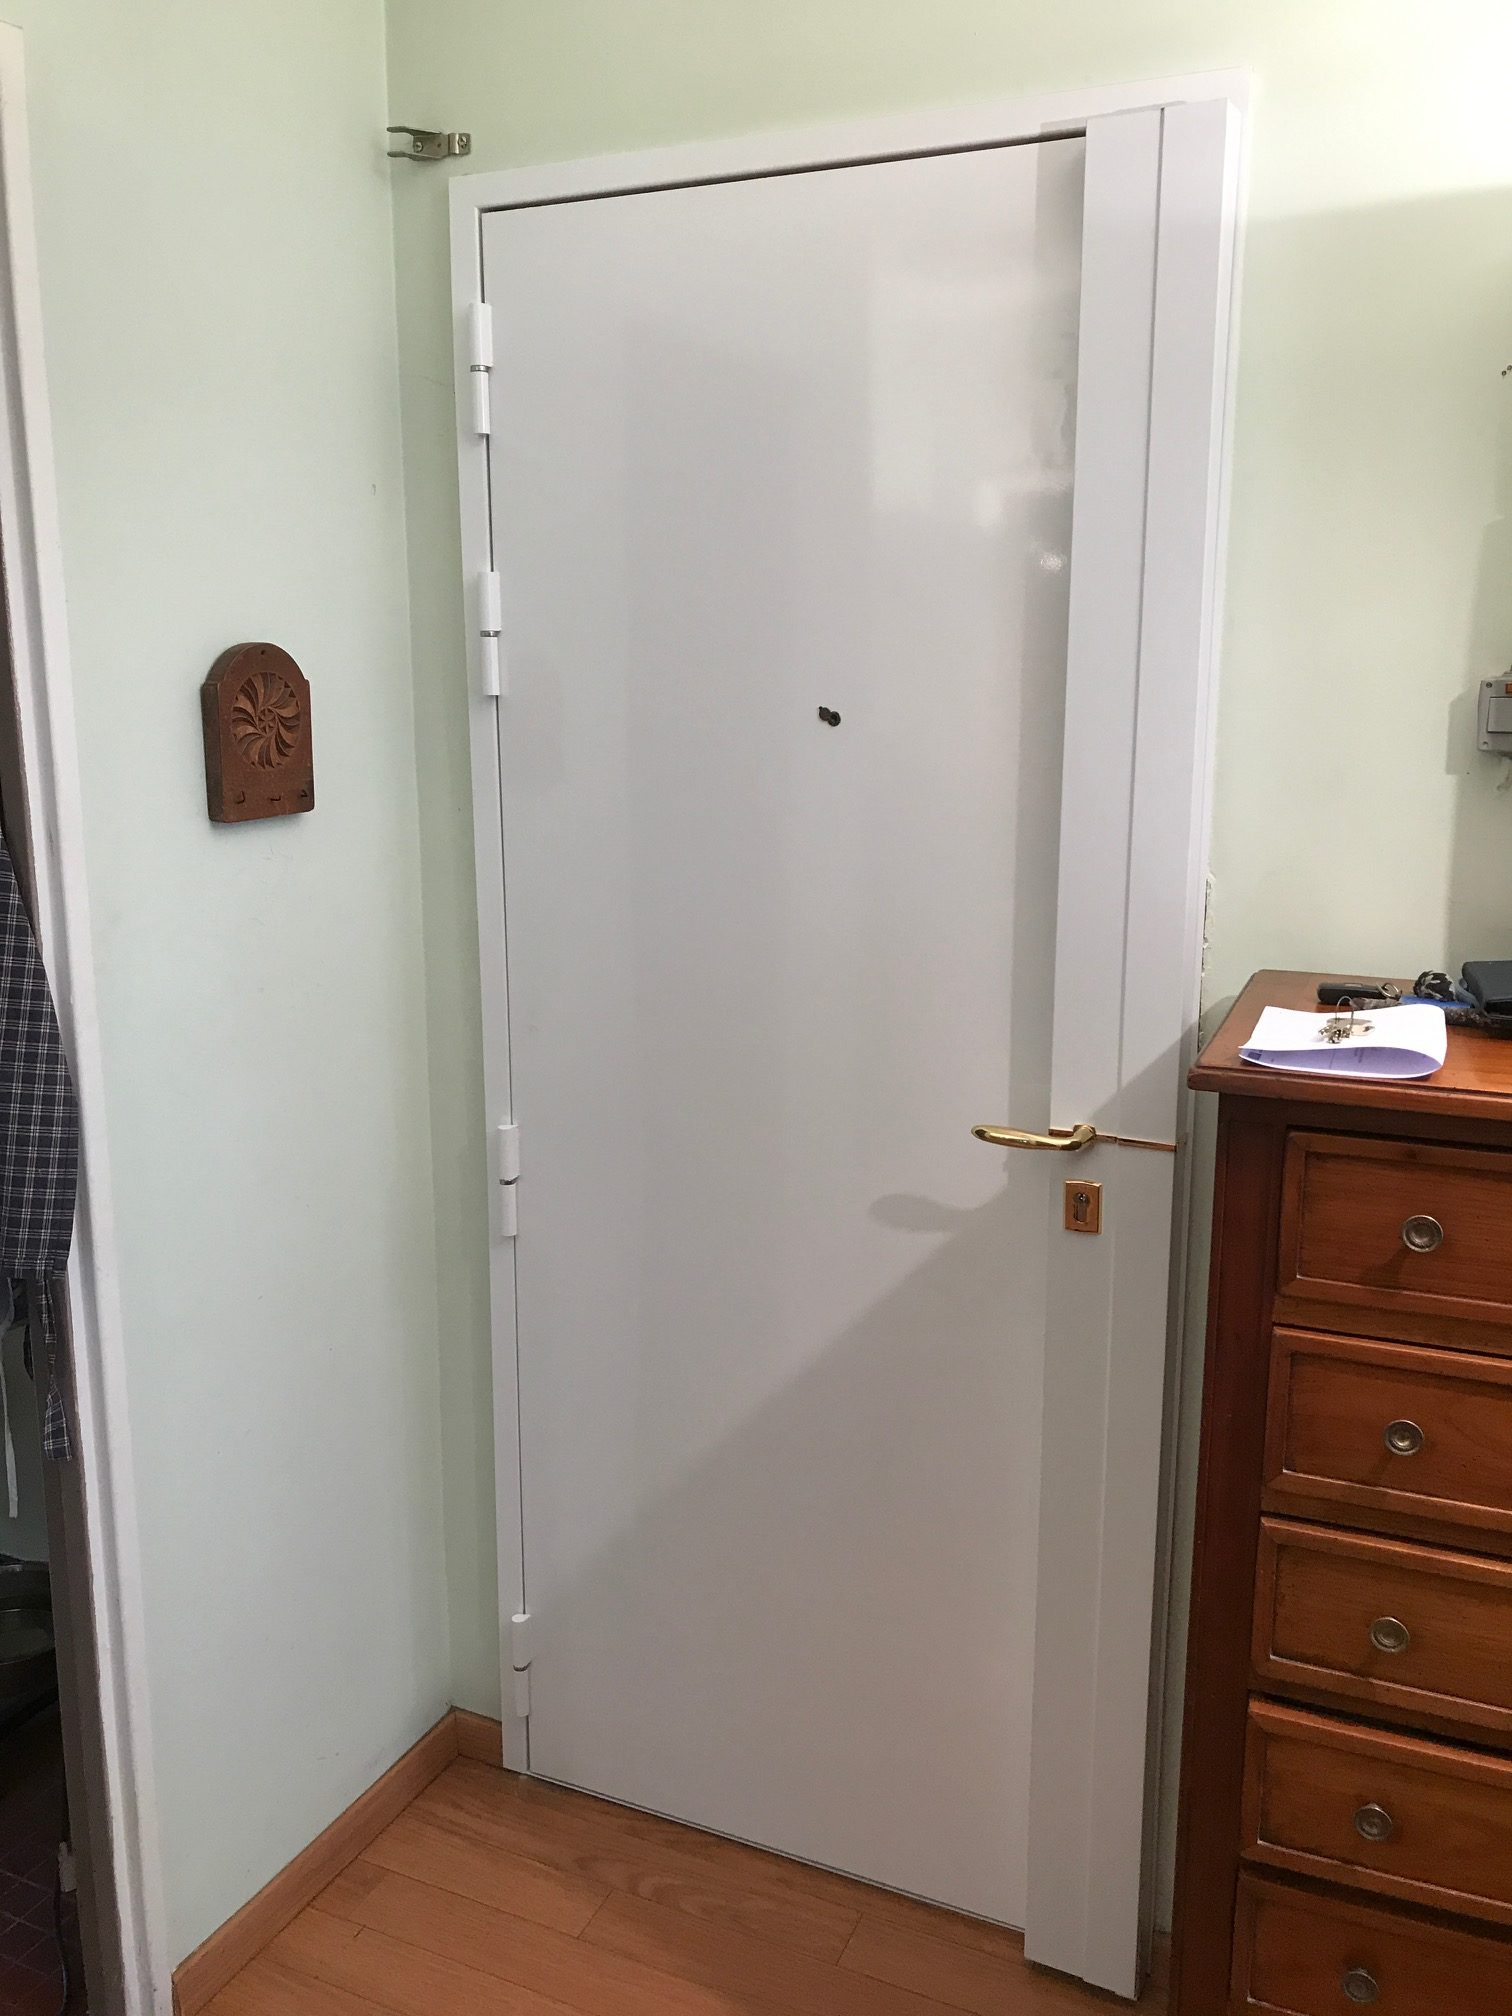 blindage de porte avec serrure fichet alicea s domoowe. Black Bedroom Furniture Sets. Home Design Ideas